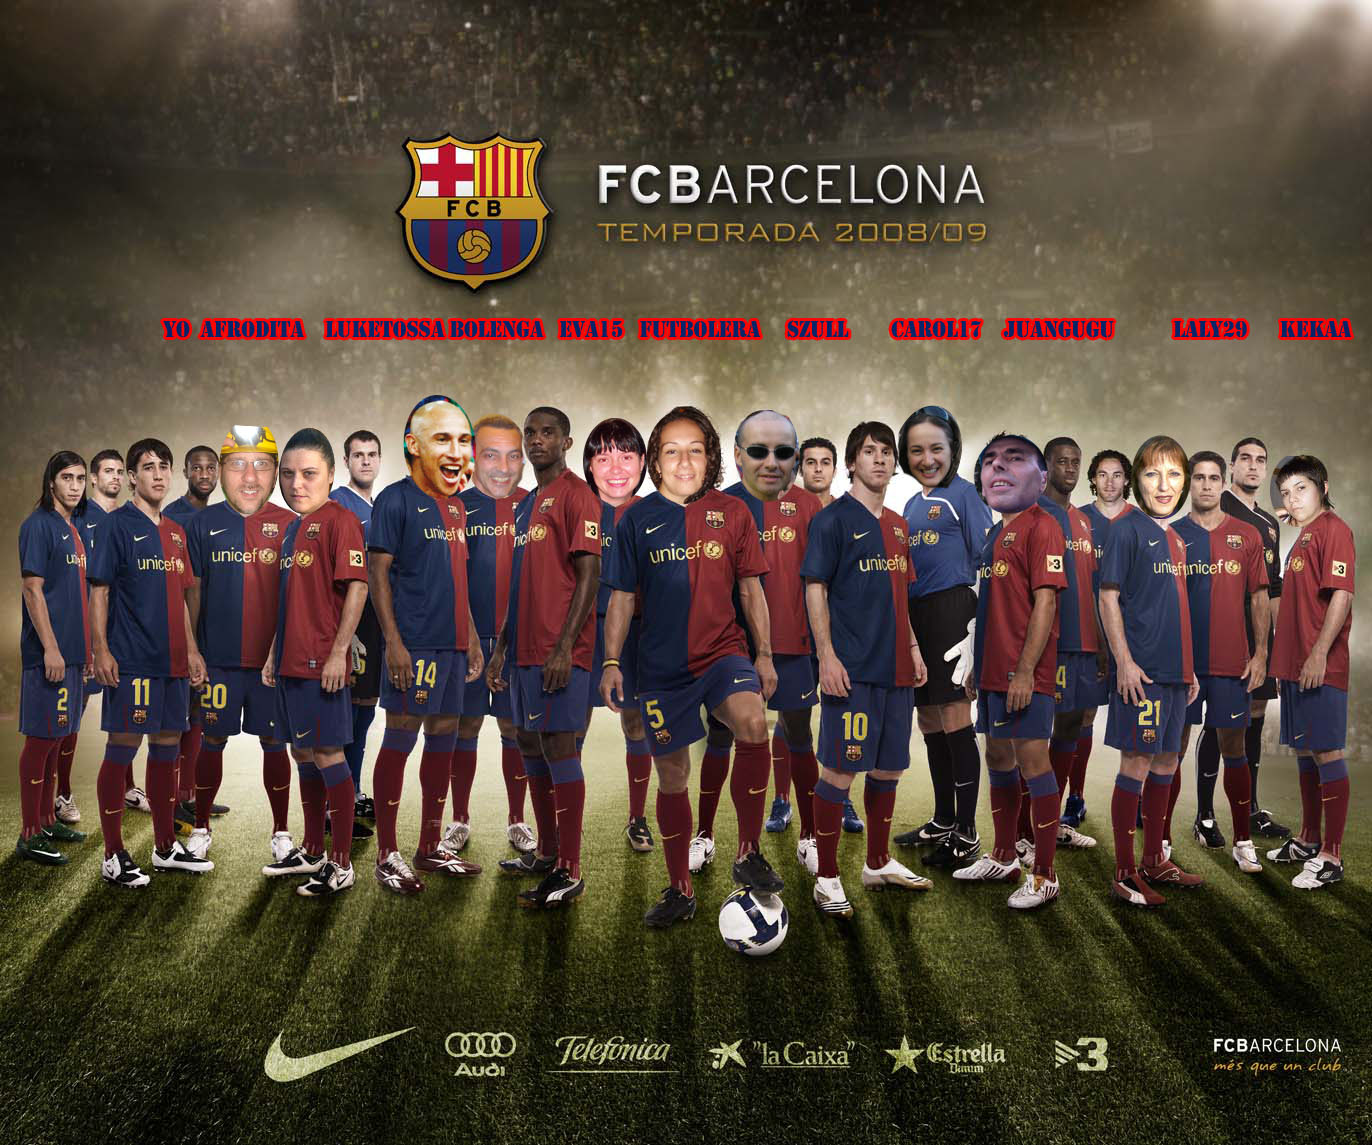 Imágenes chistosas de messi cr7 Fútbol Taringa!